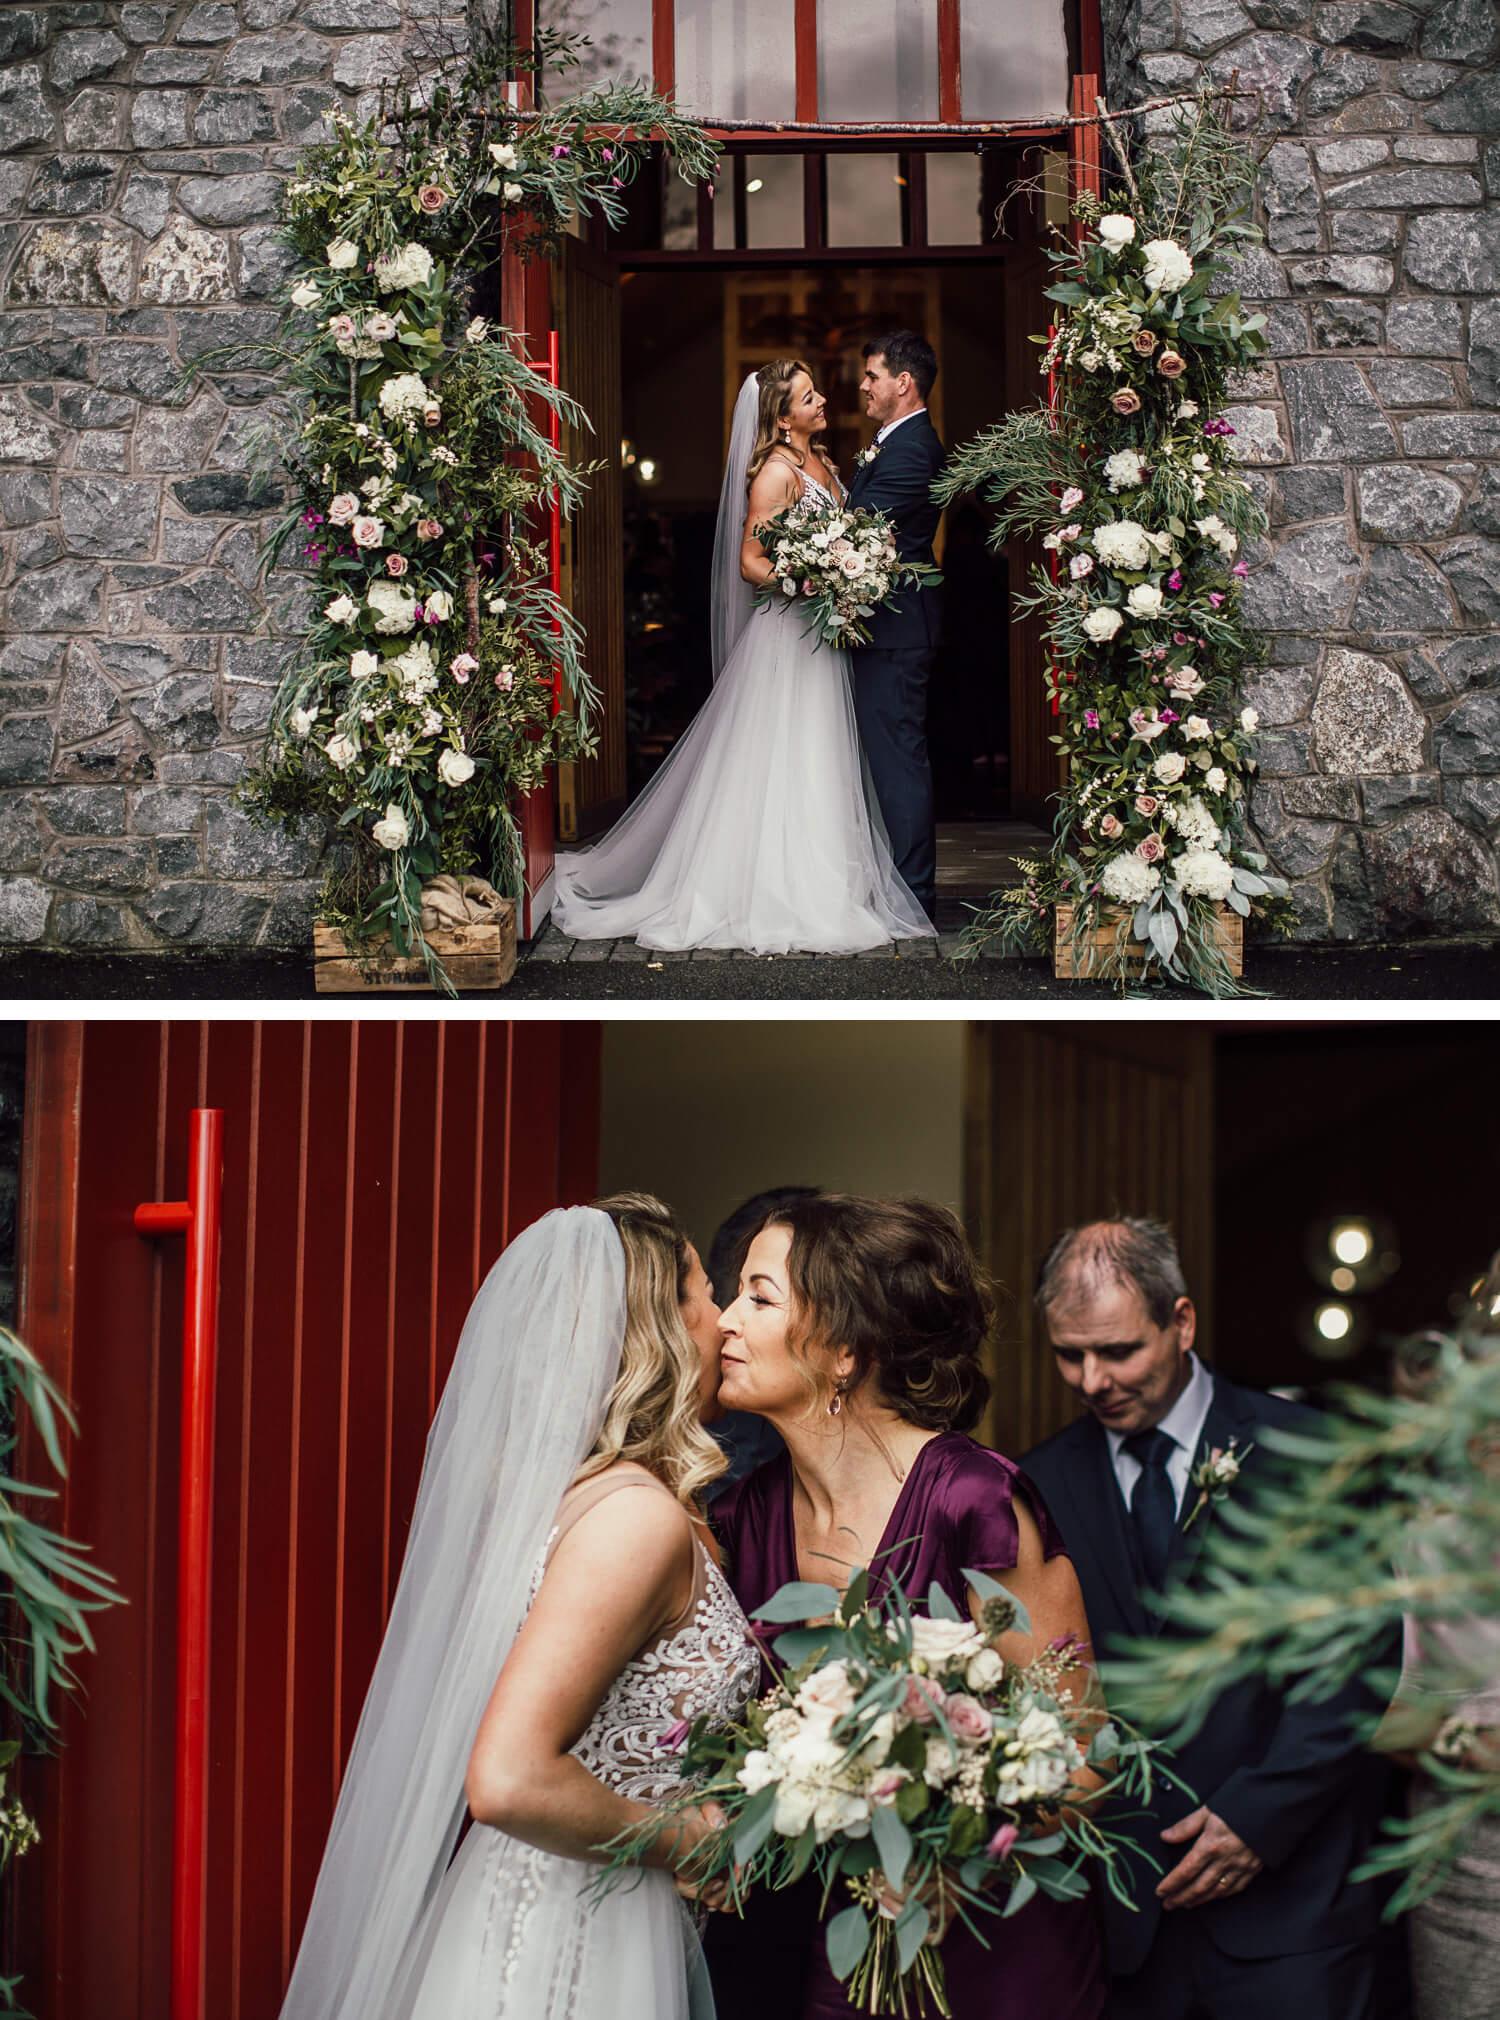 darren-fitzpatrick-photography- killyhevlin-wedding 16